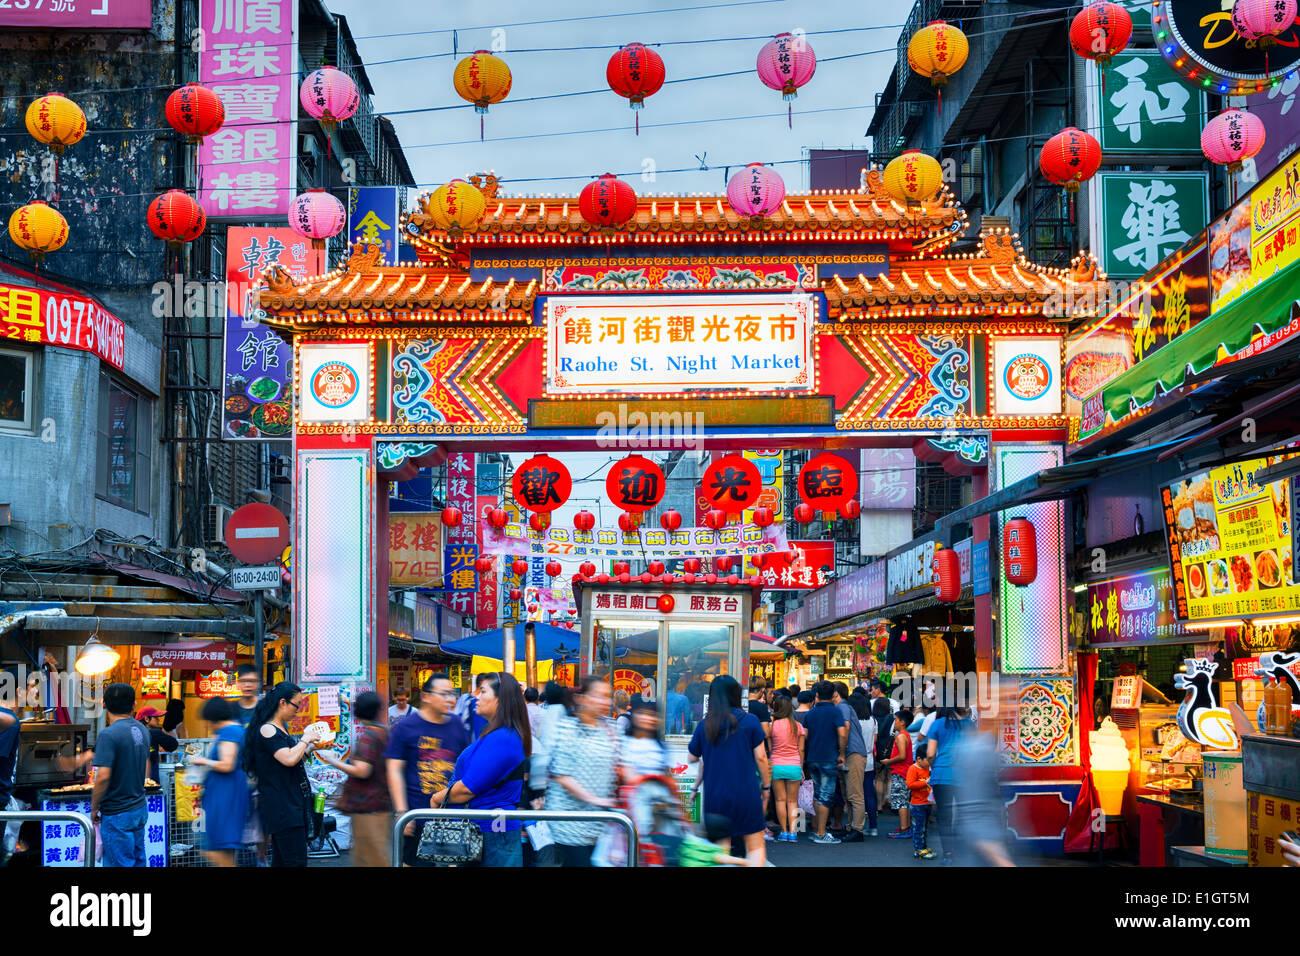 Entrance of Raohe Street Night Market in Taipei. Stock Photo